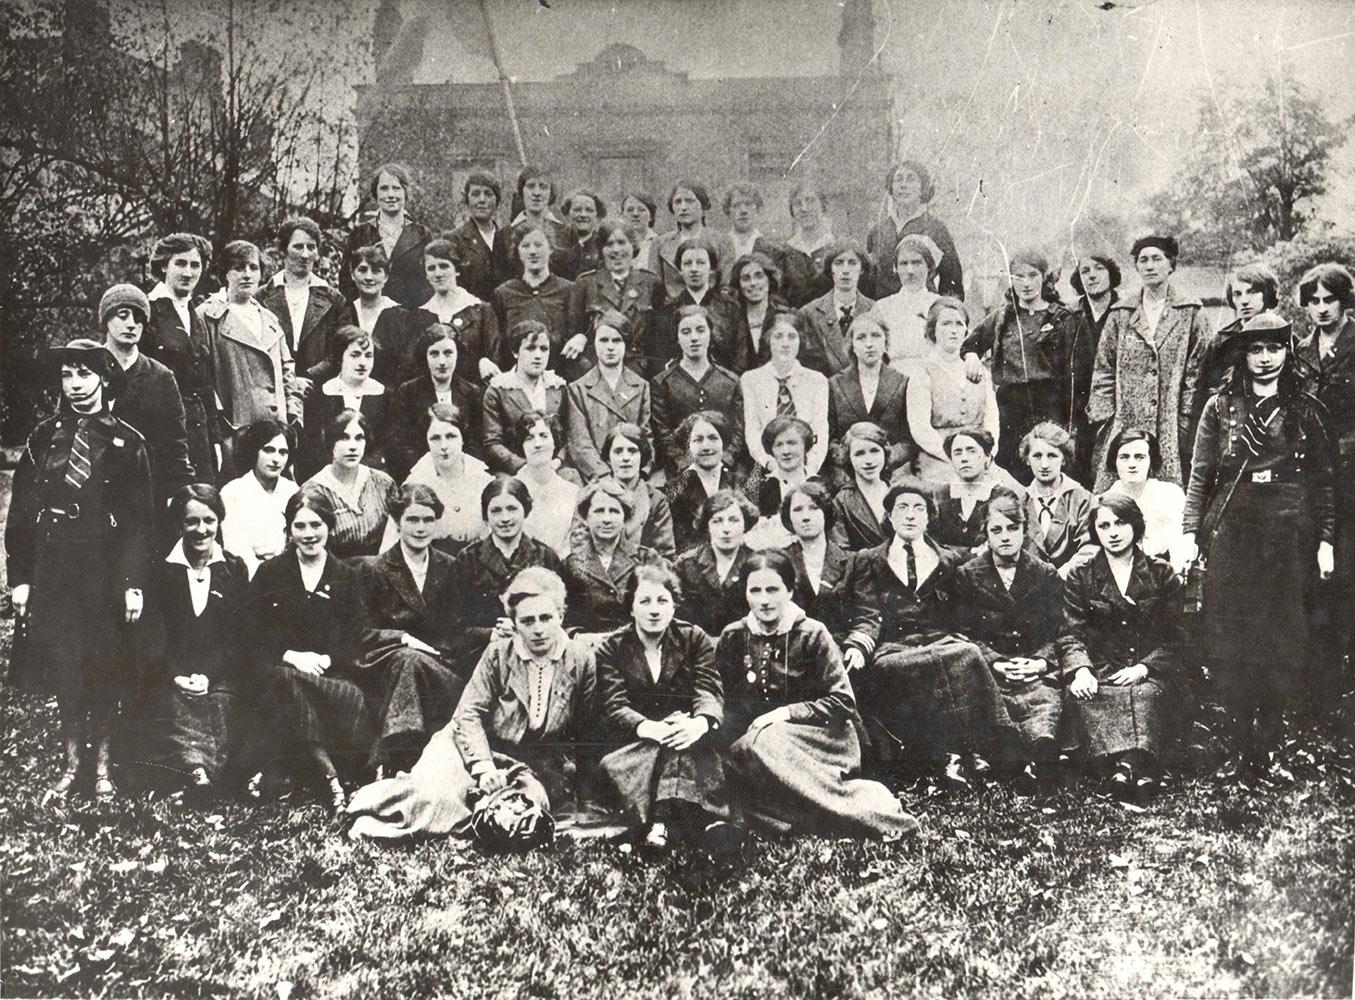 Women Participants in 1916 Risings